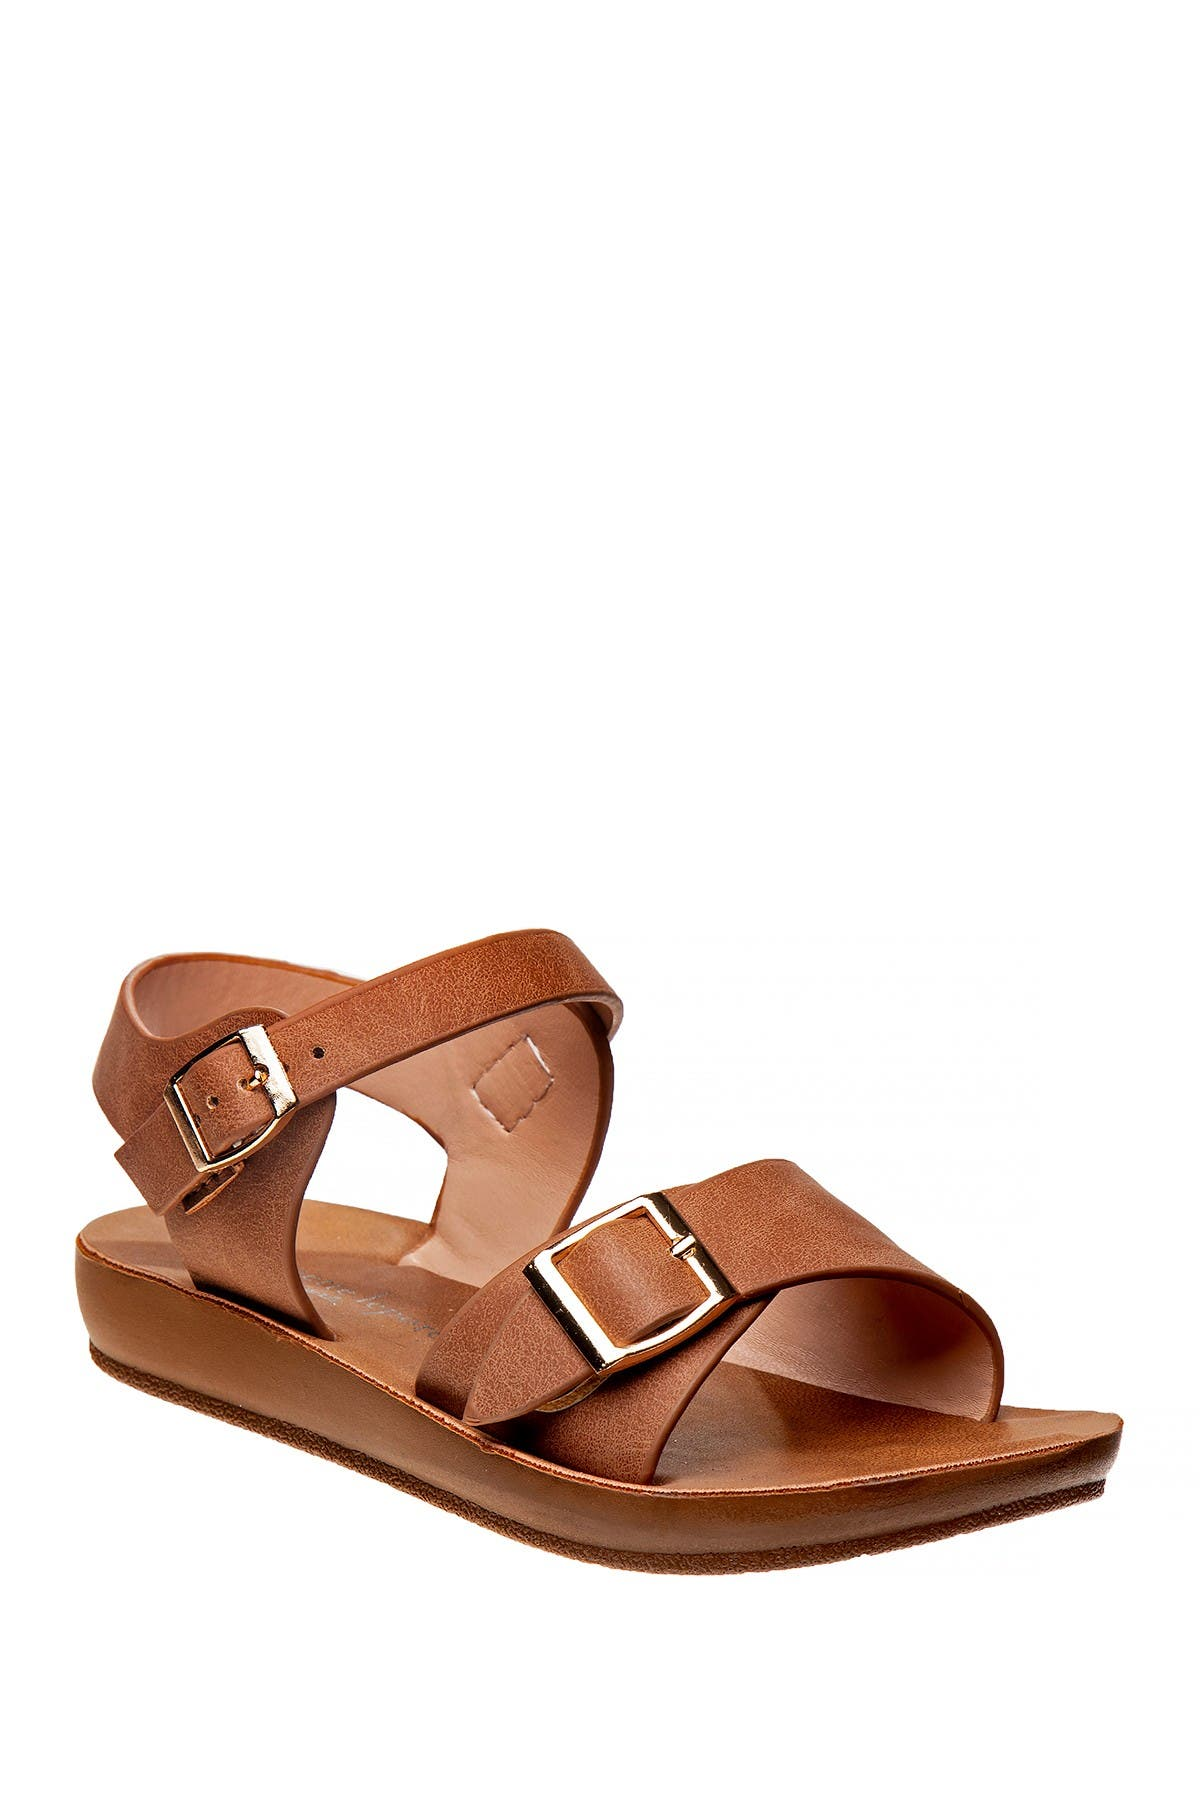 Image of Nanette Lepore Double Buckle Sandal